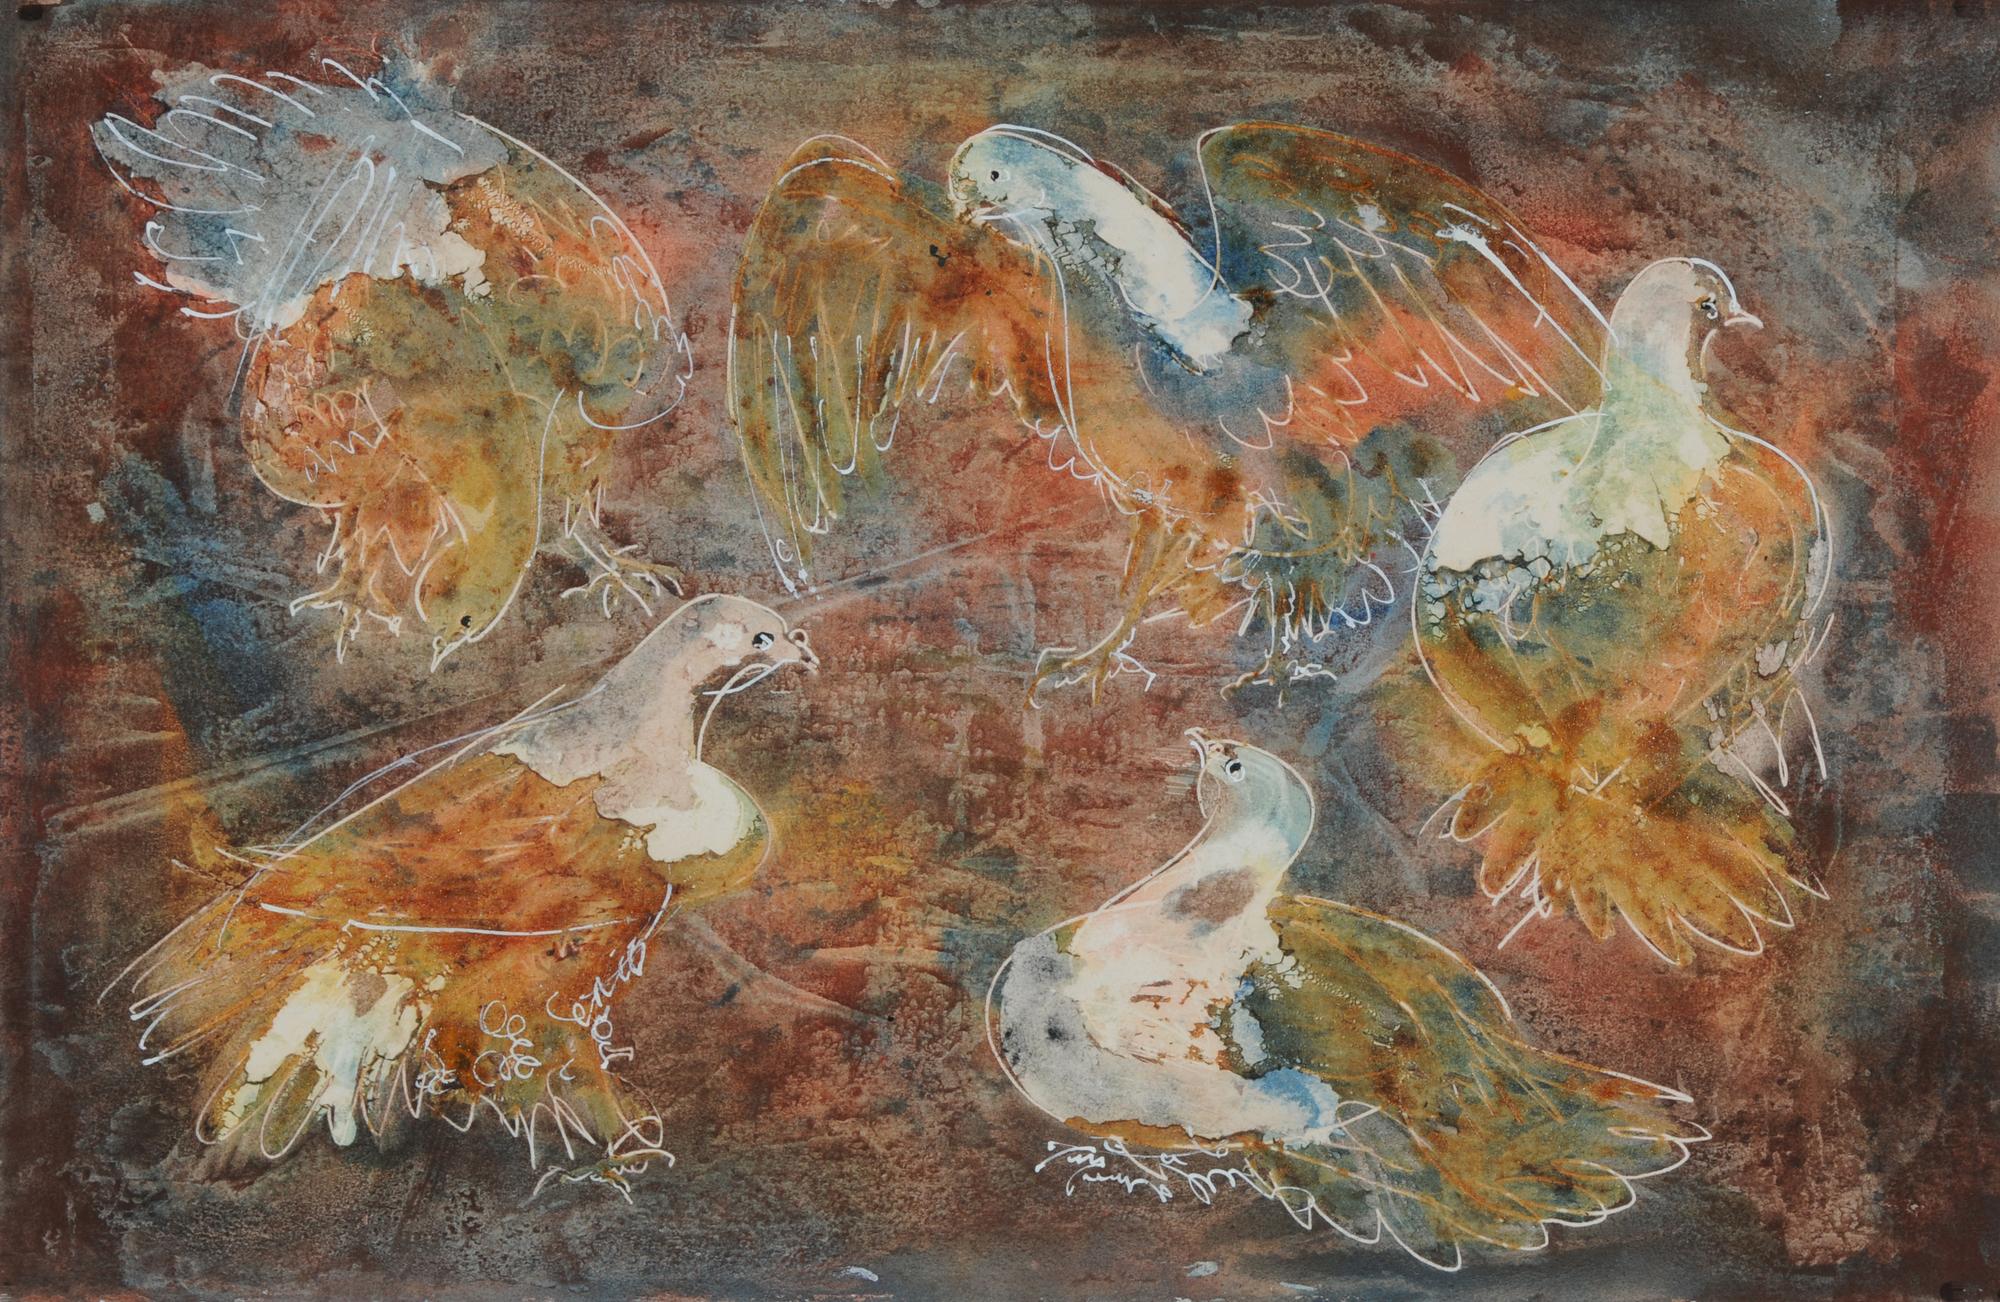 Erni Hans, Tauben (Pigeons)